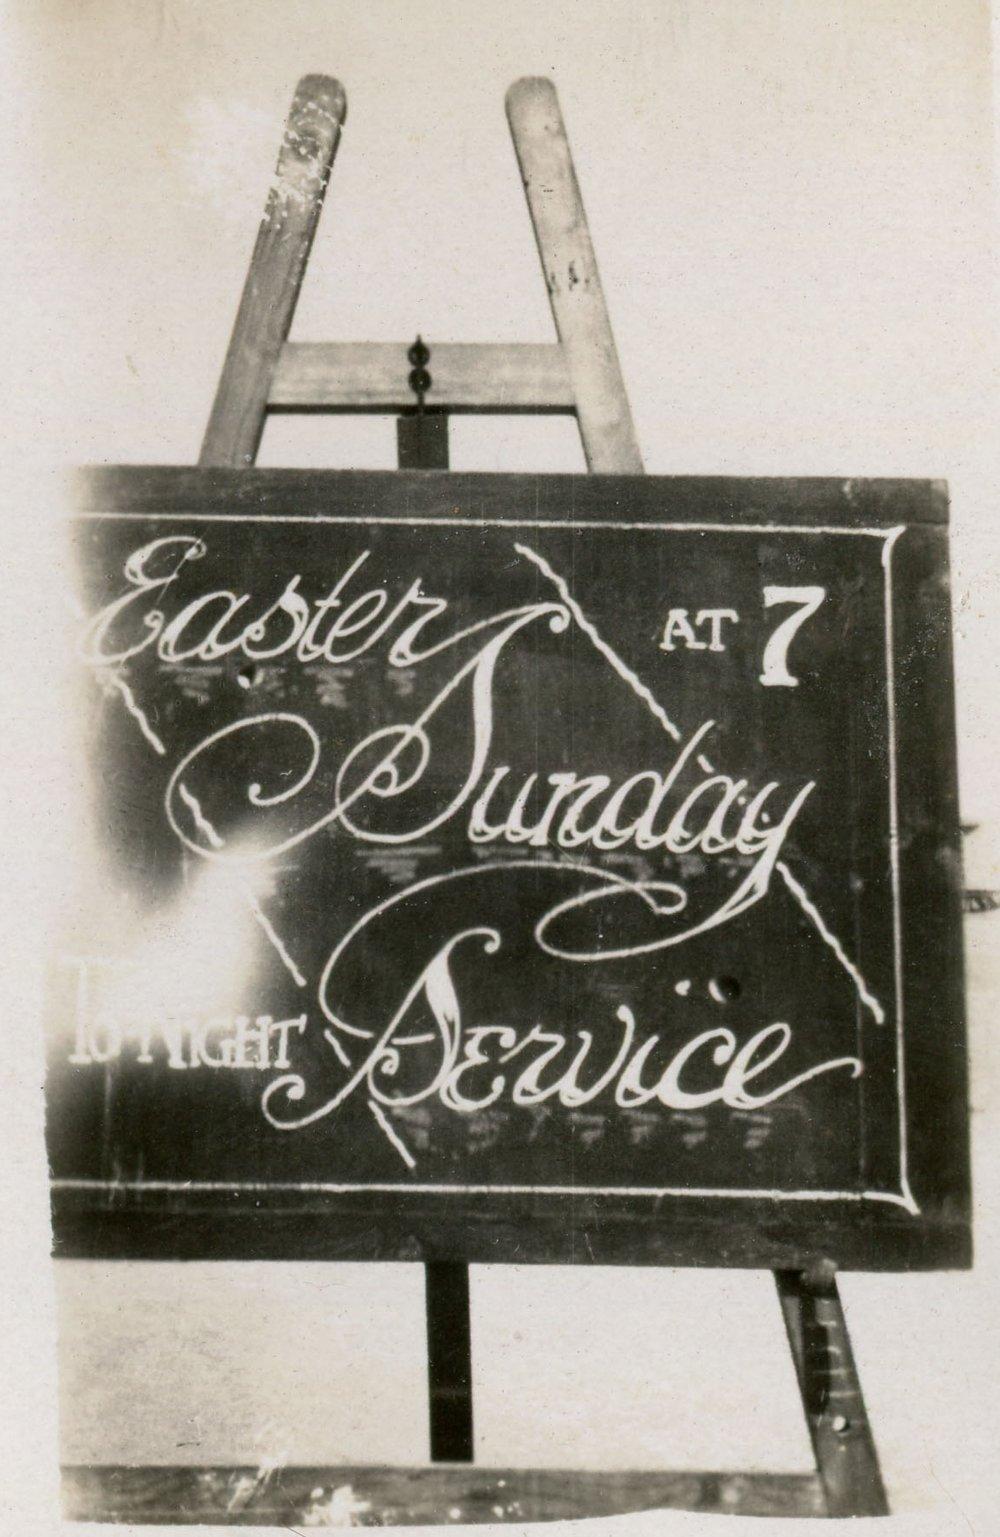 reg walters076 Easter Sunday Service.jpg